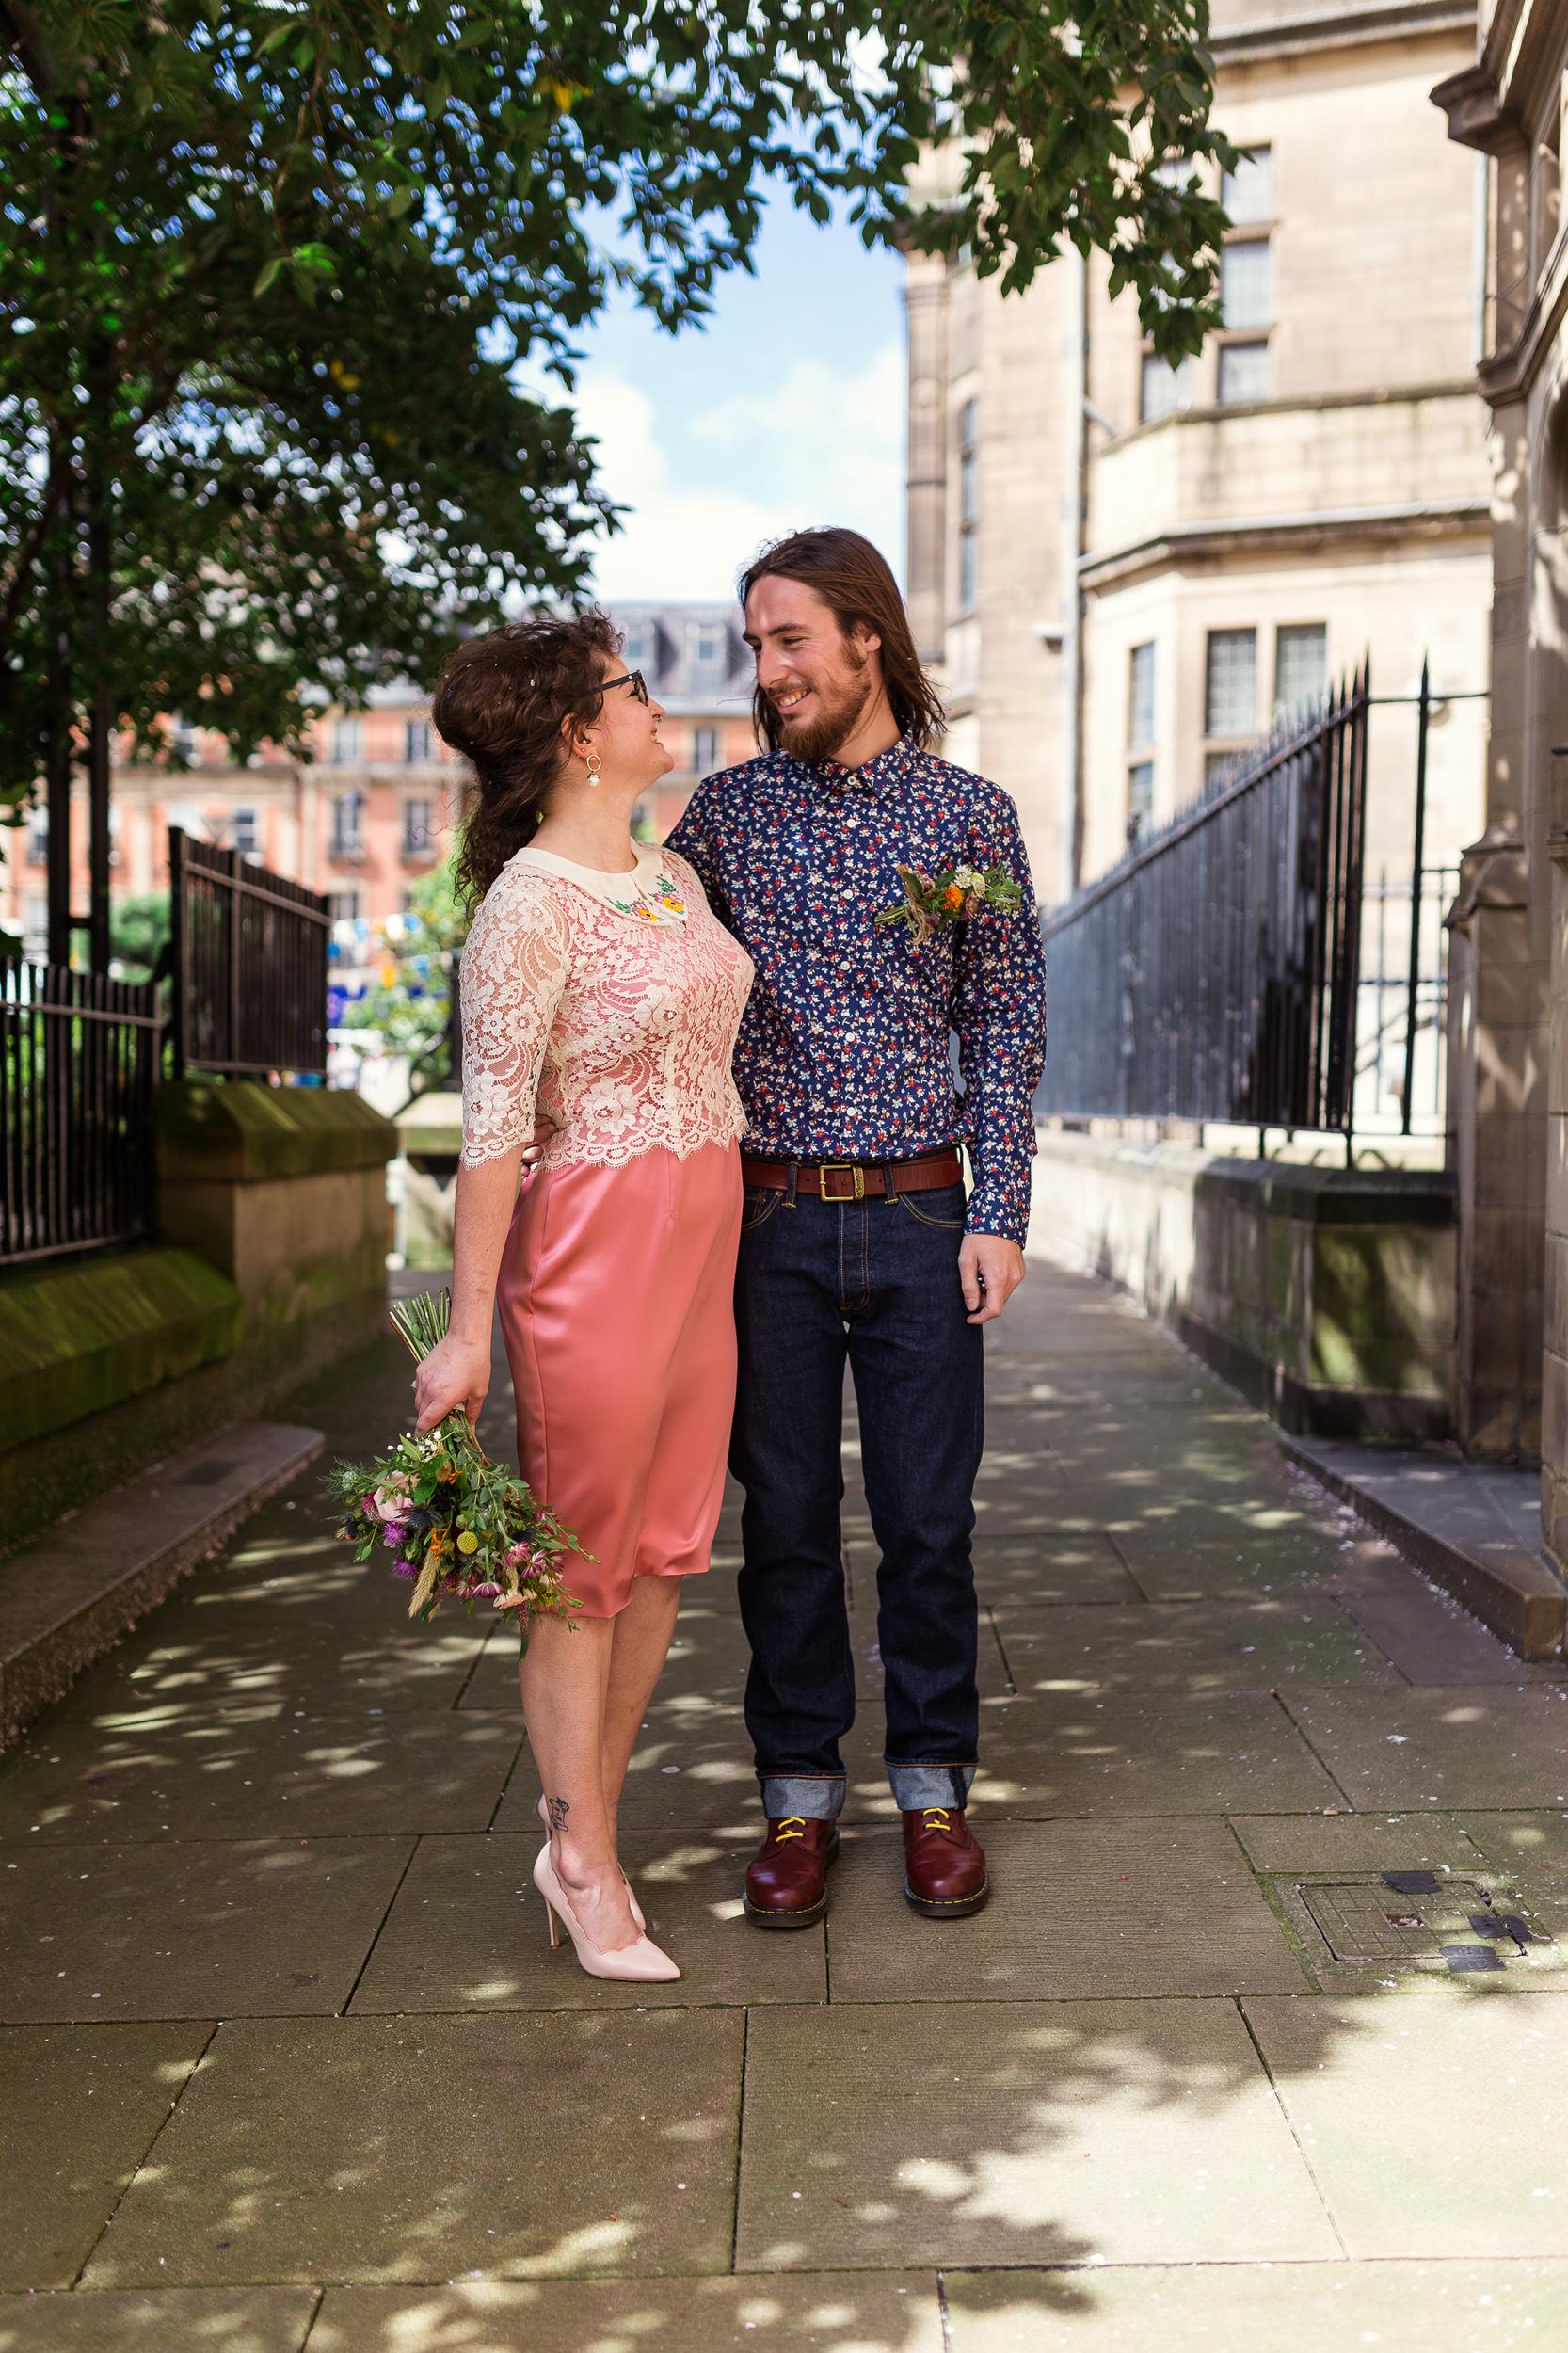 Emma-Coloured-Wedding-Dress-Sheffield-Kate-Beaumont-12.jpg